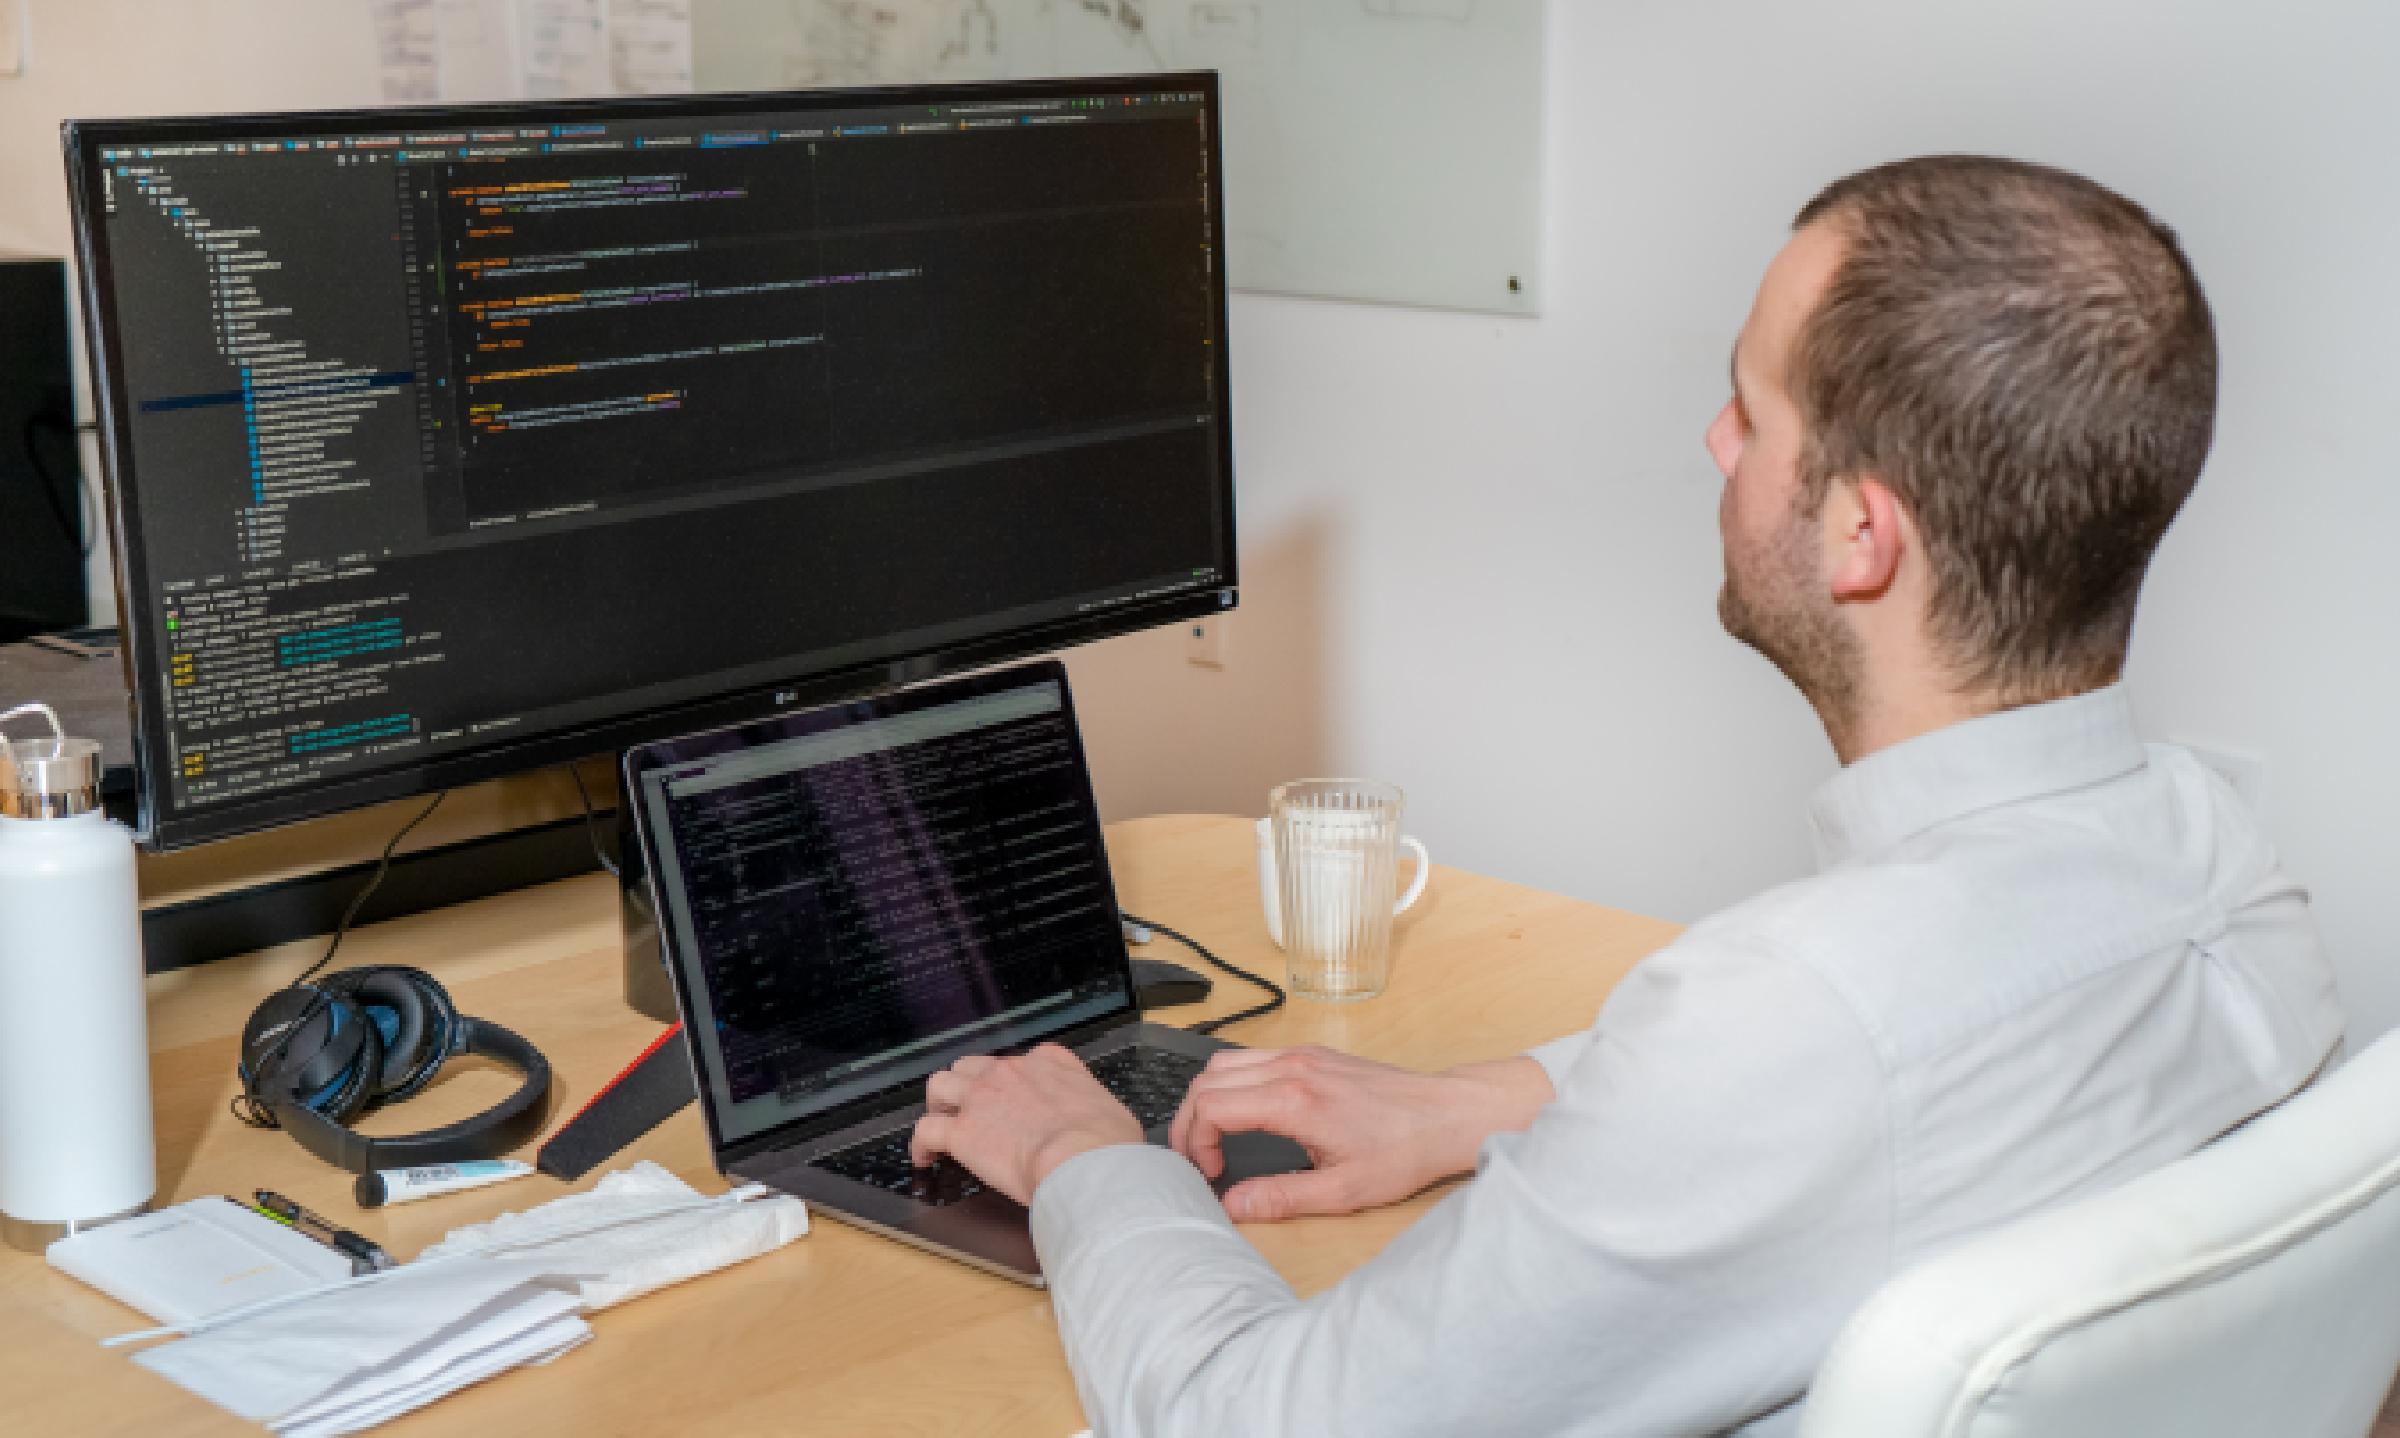 Person looking at desktop screen